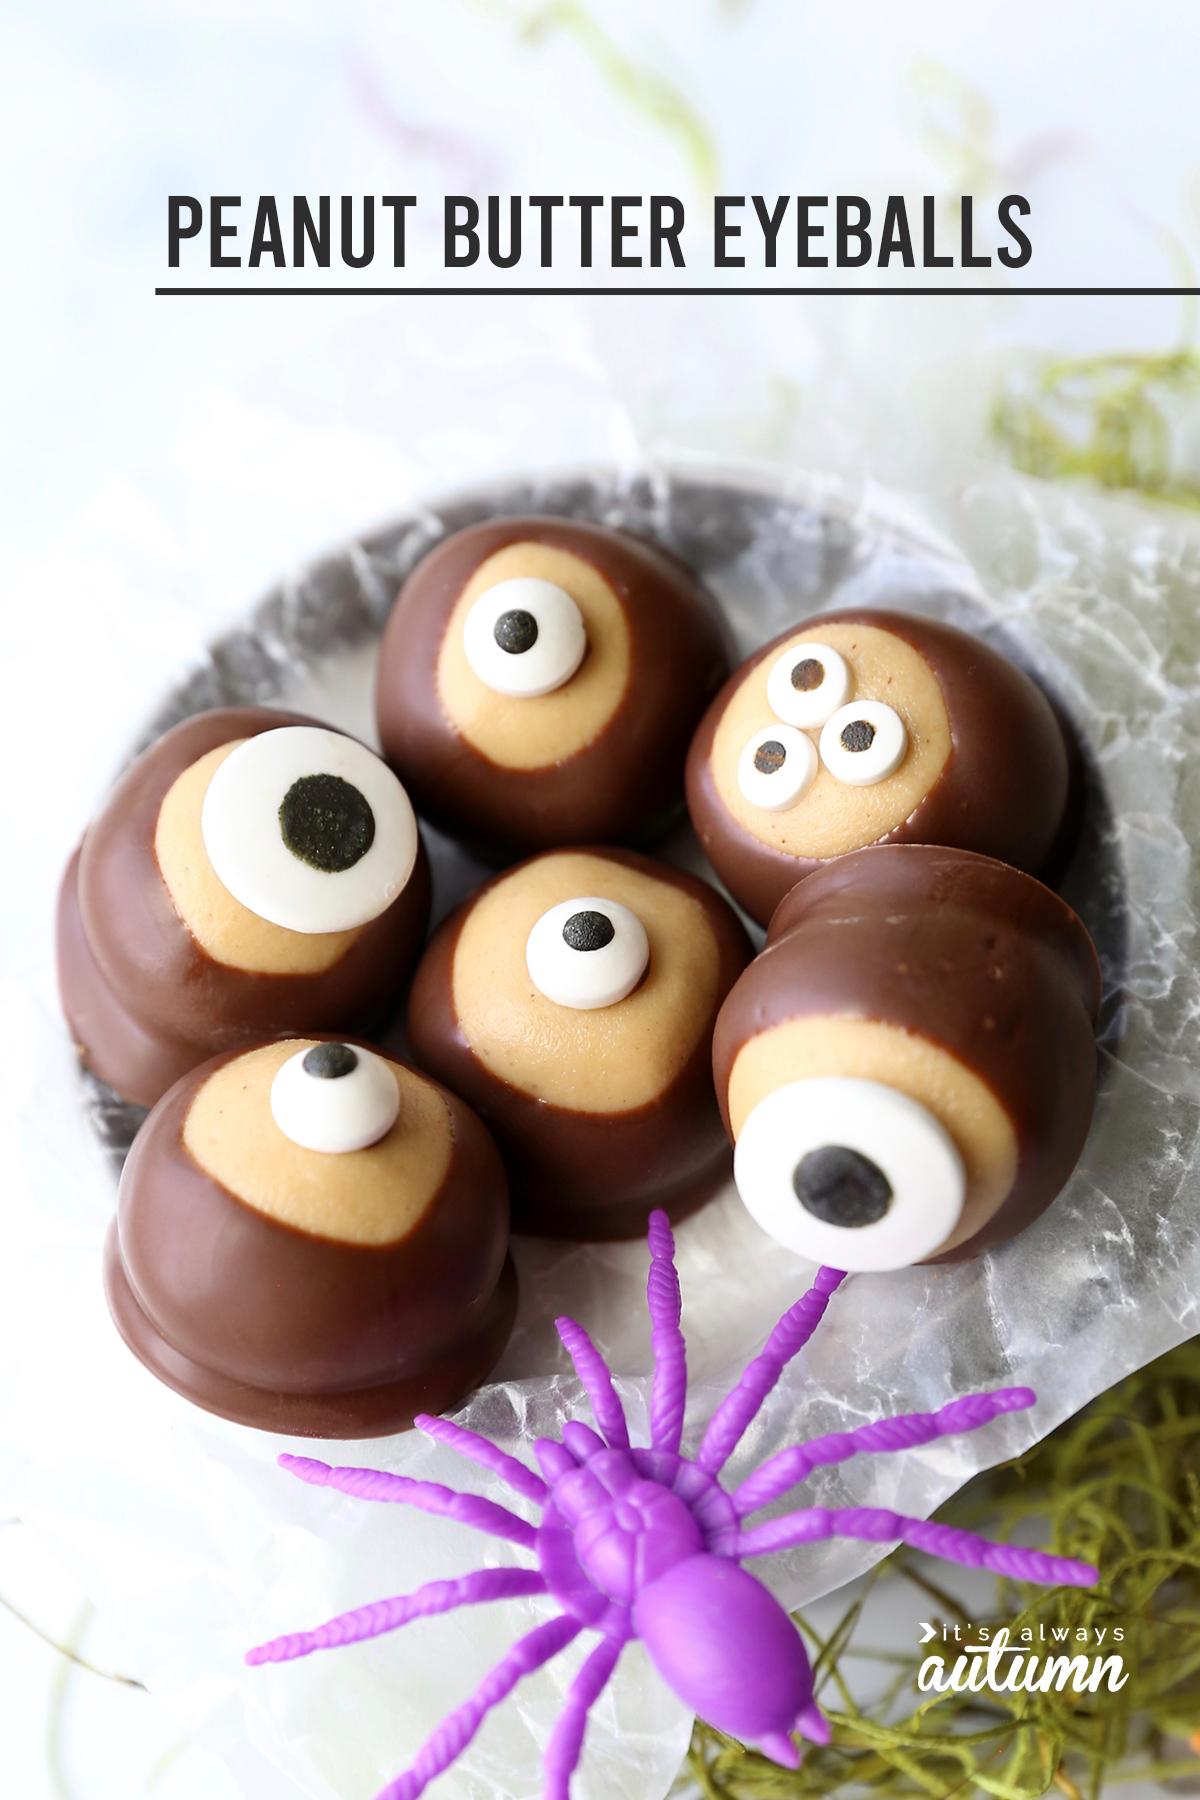 Peanut butter eyeballs are an easy Halloween treat!